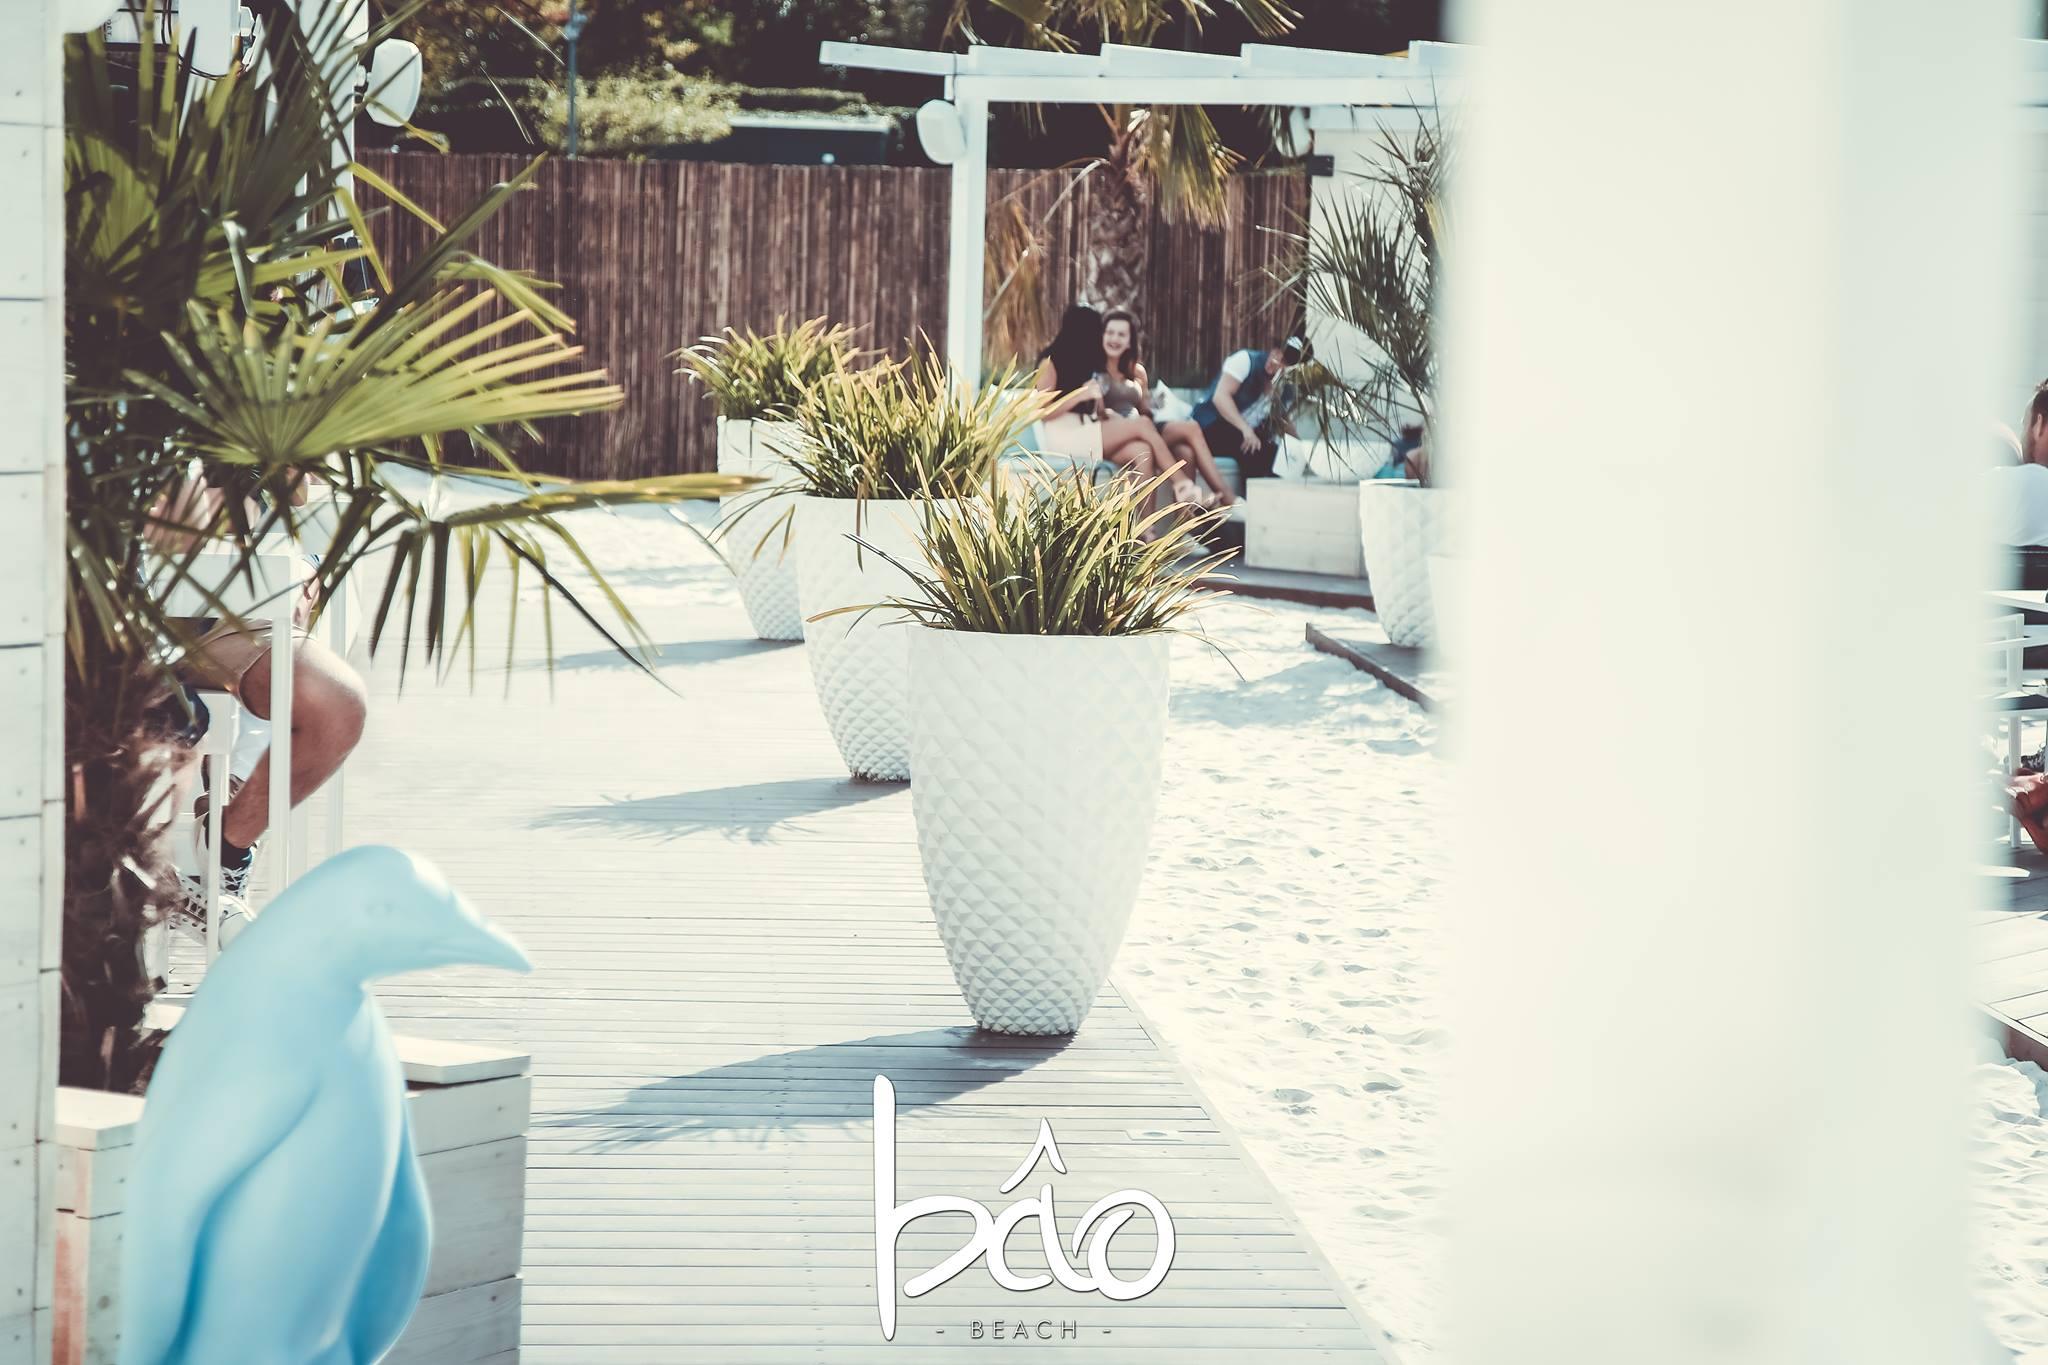 Sfeerbeeld BÂO beach